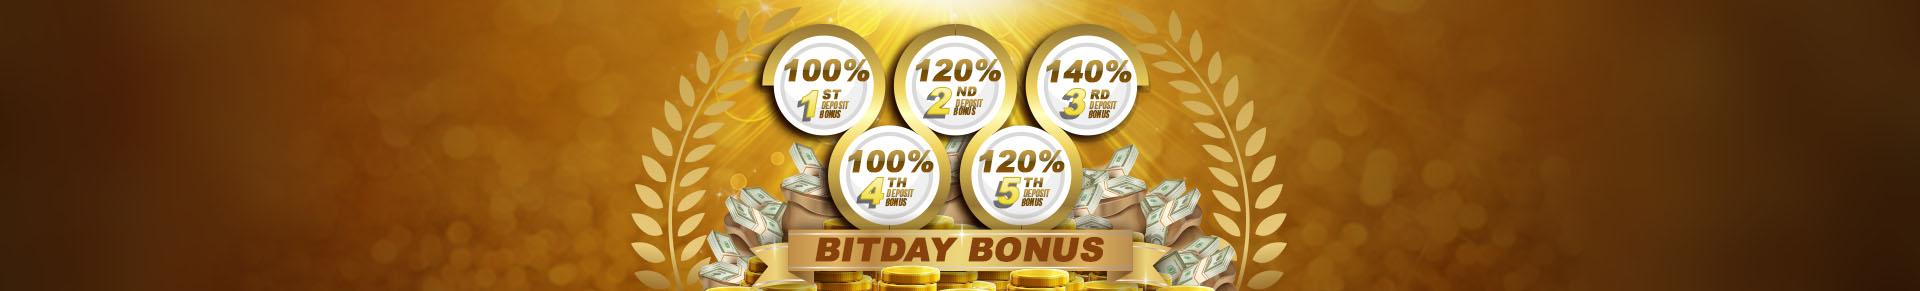 BitDay Bonus